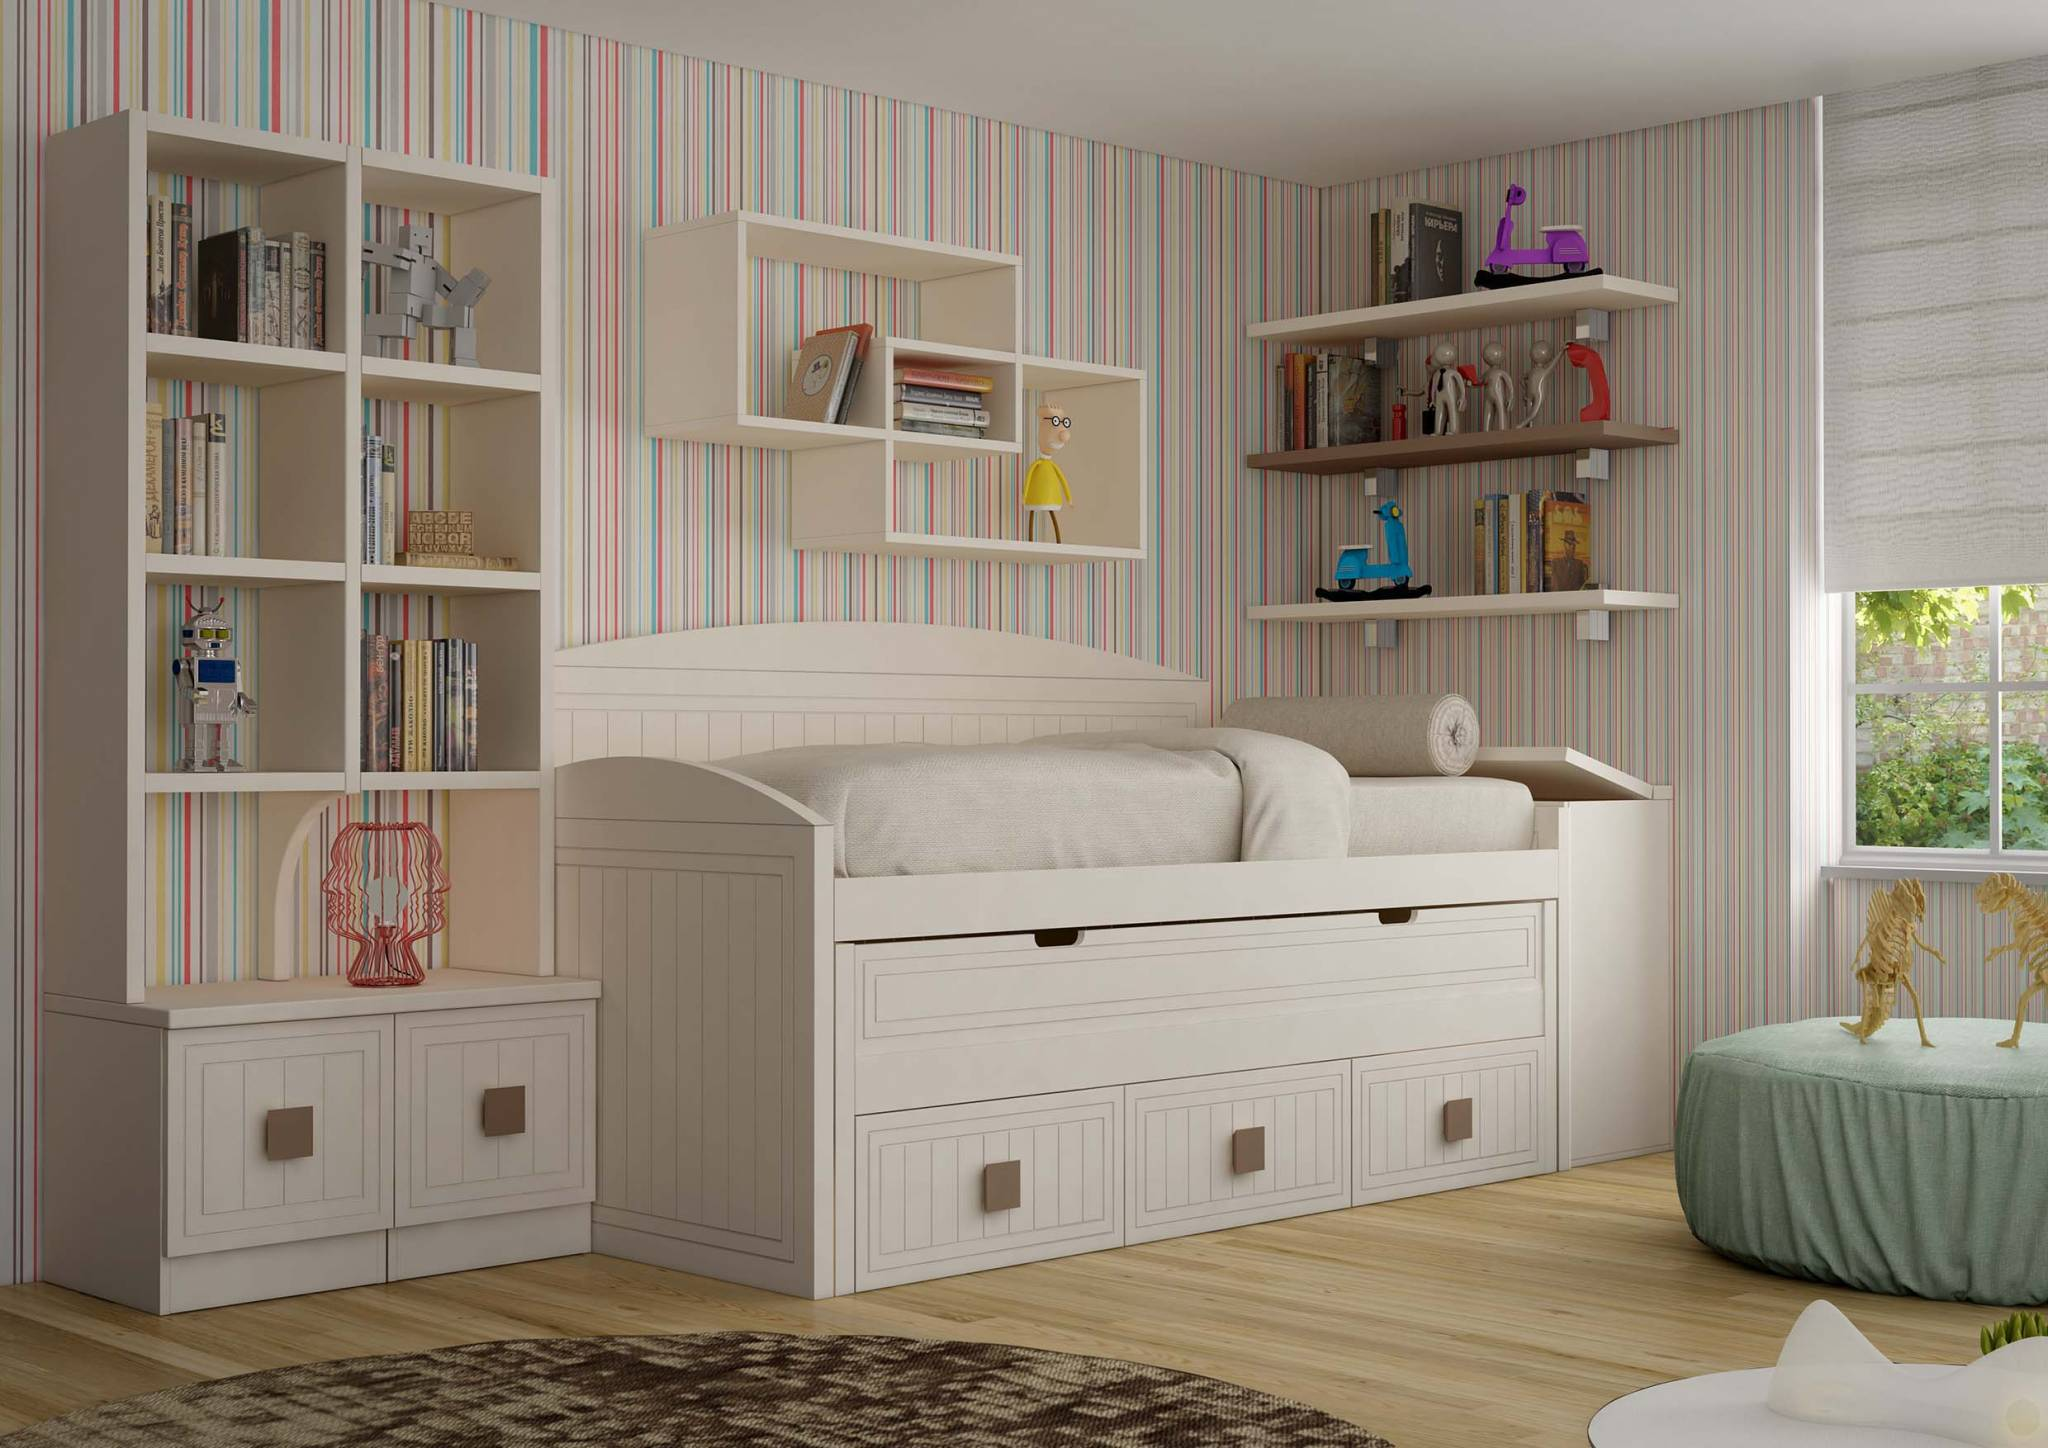 Juvenil lacado tabara muebles d azmuebles d az - Baules para dormitorios ...